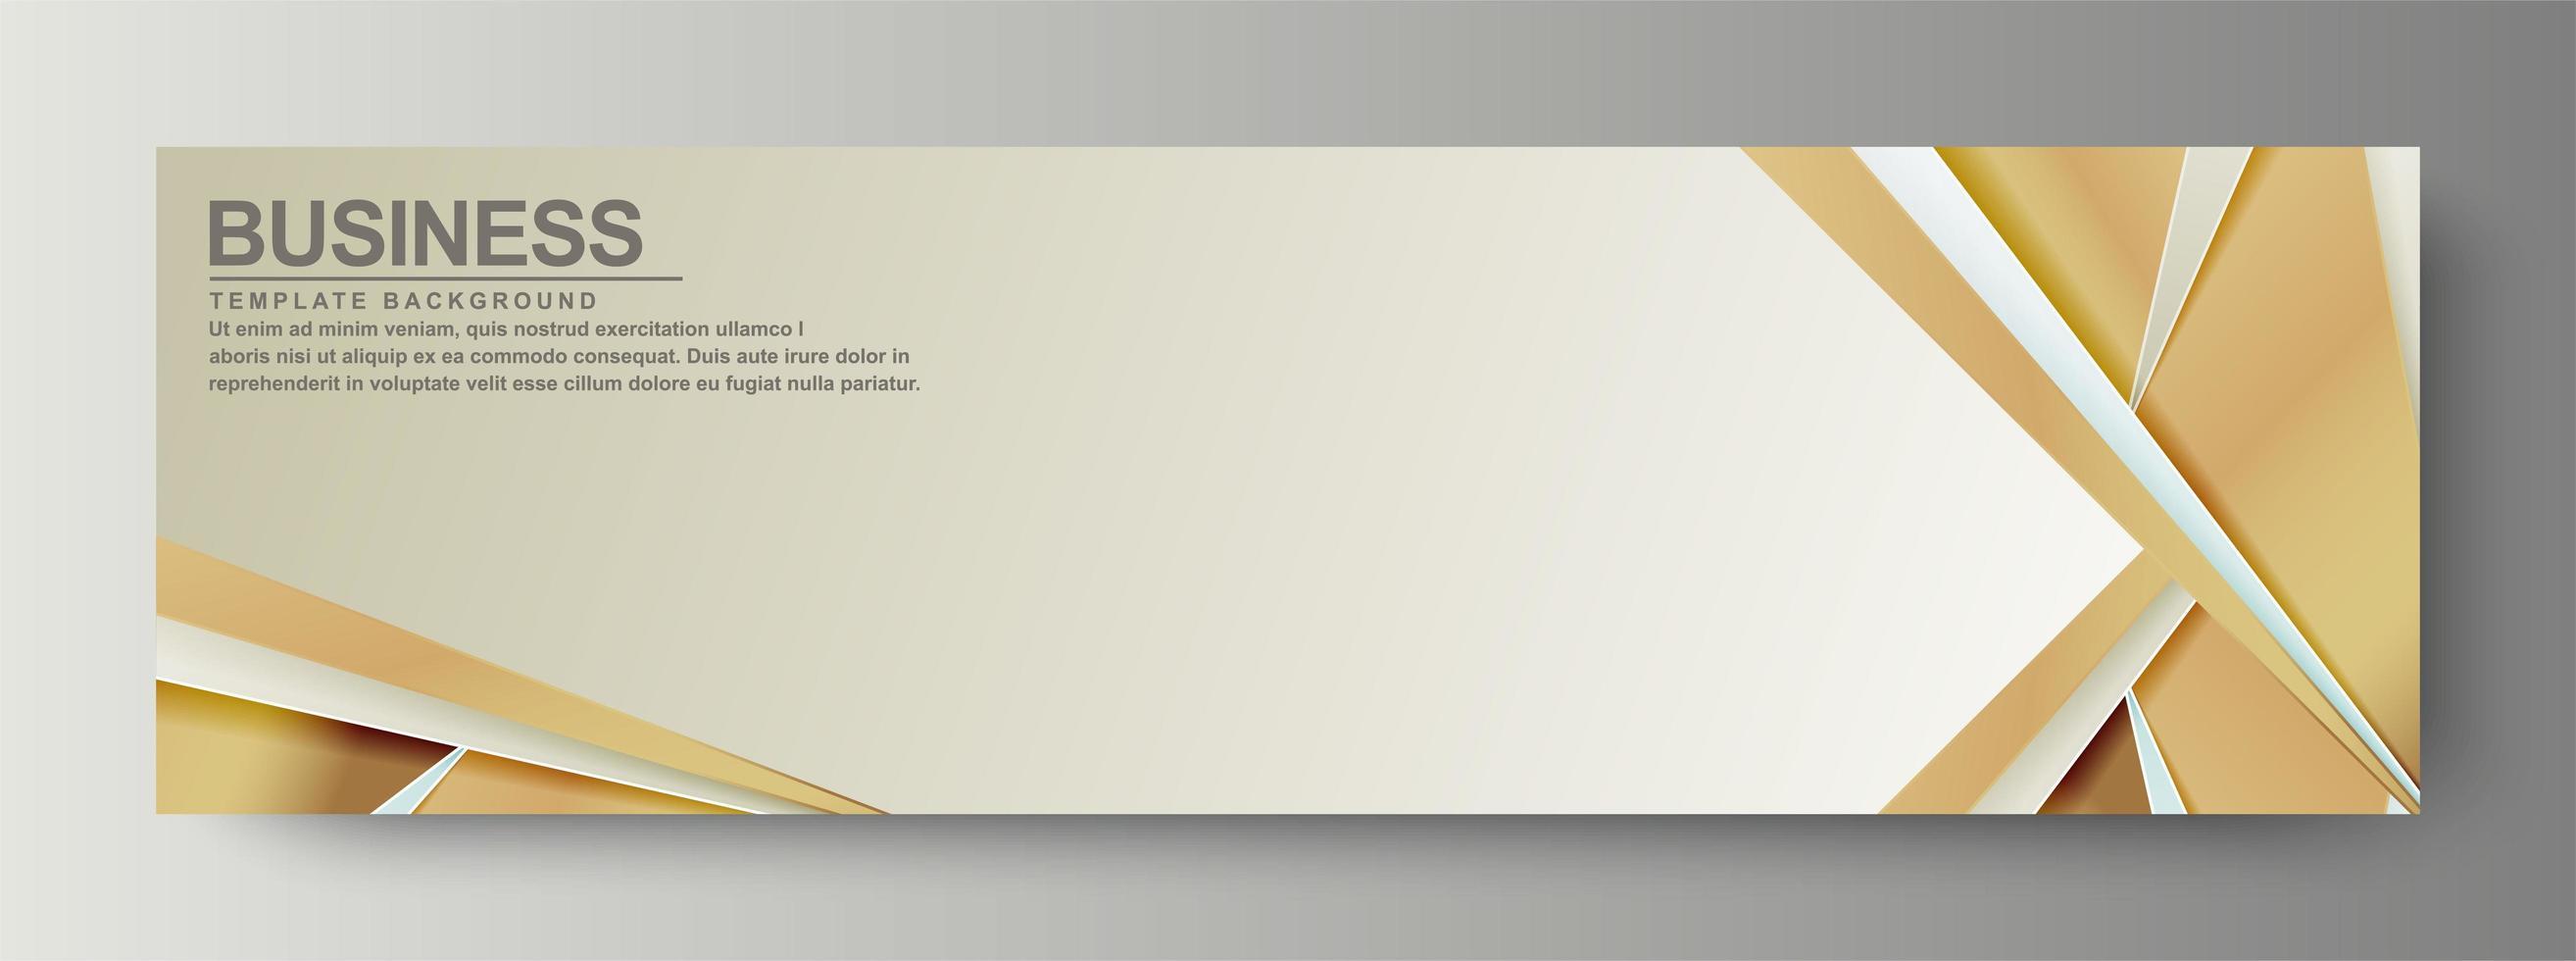 Luxury business banner background vector